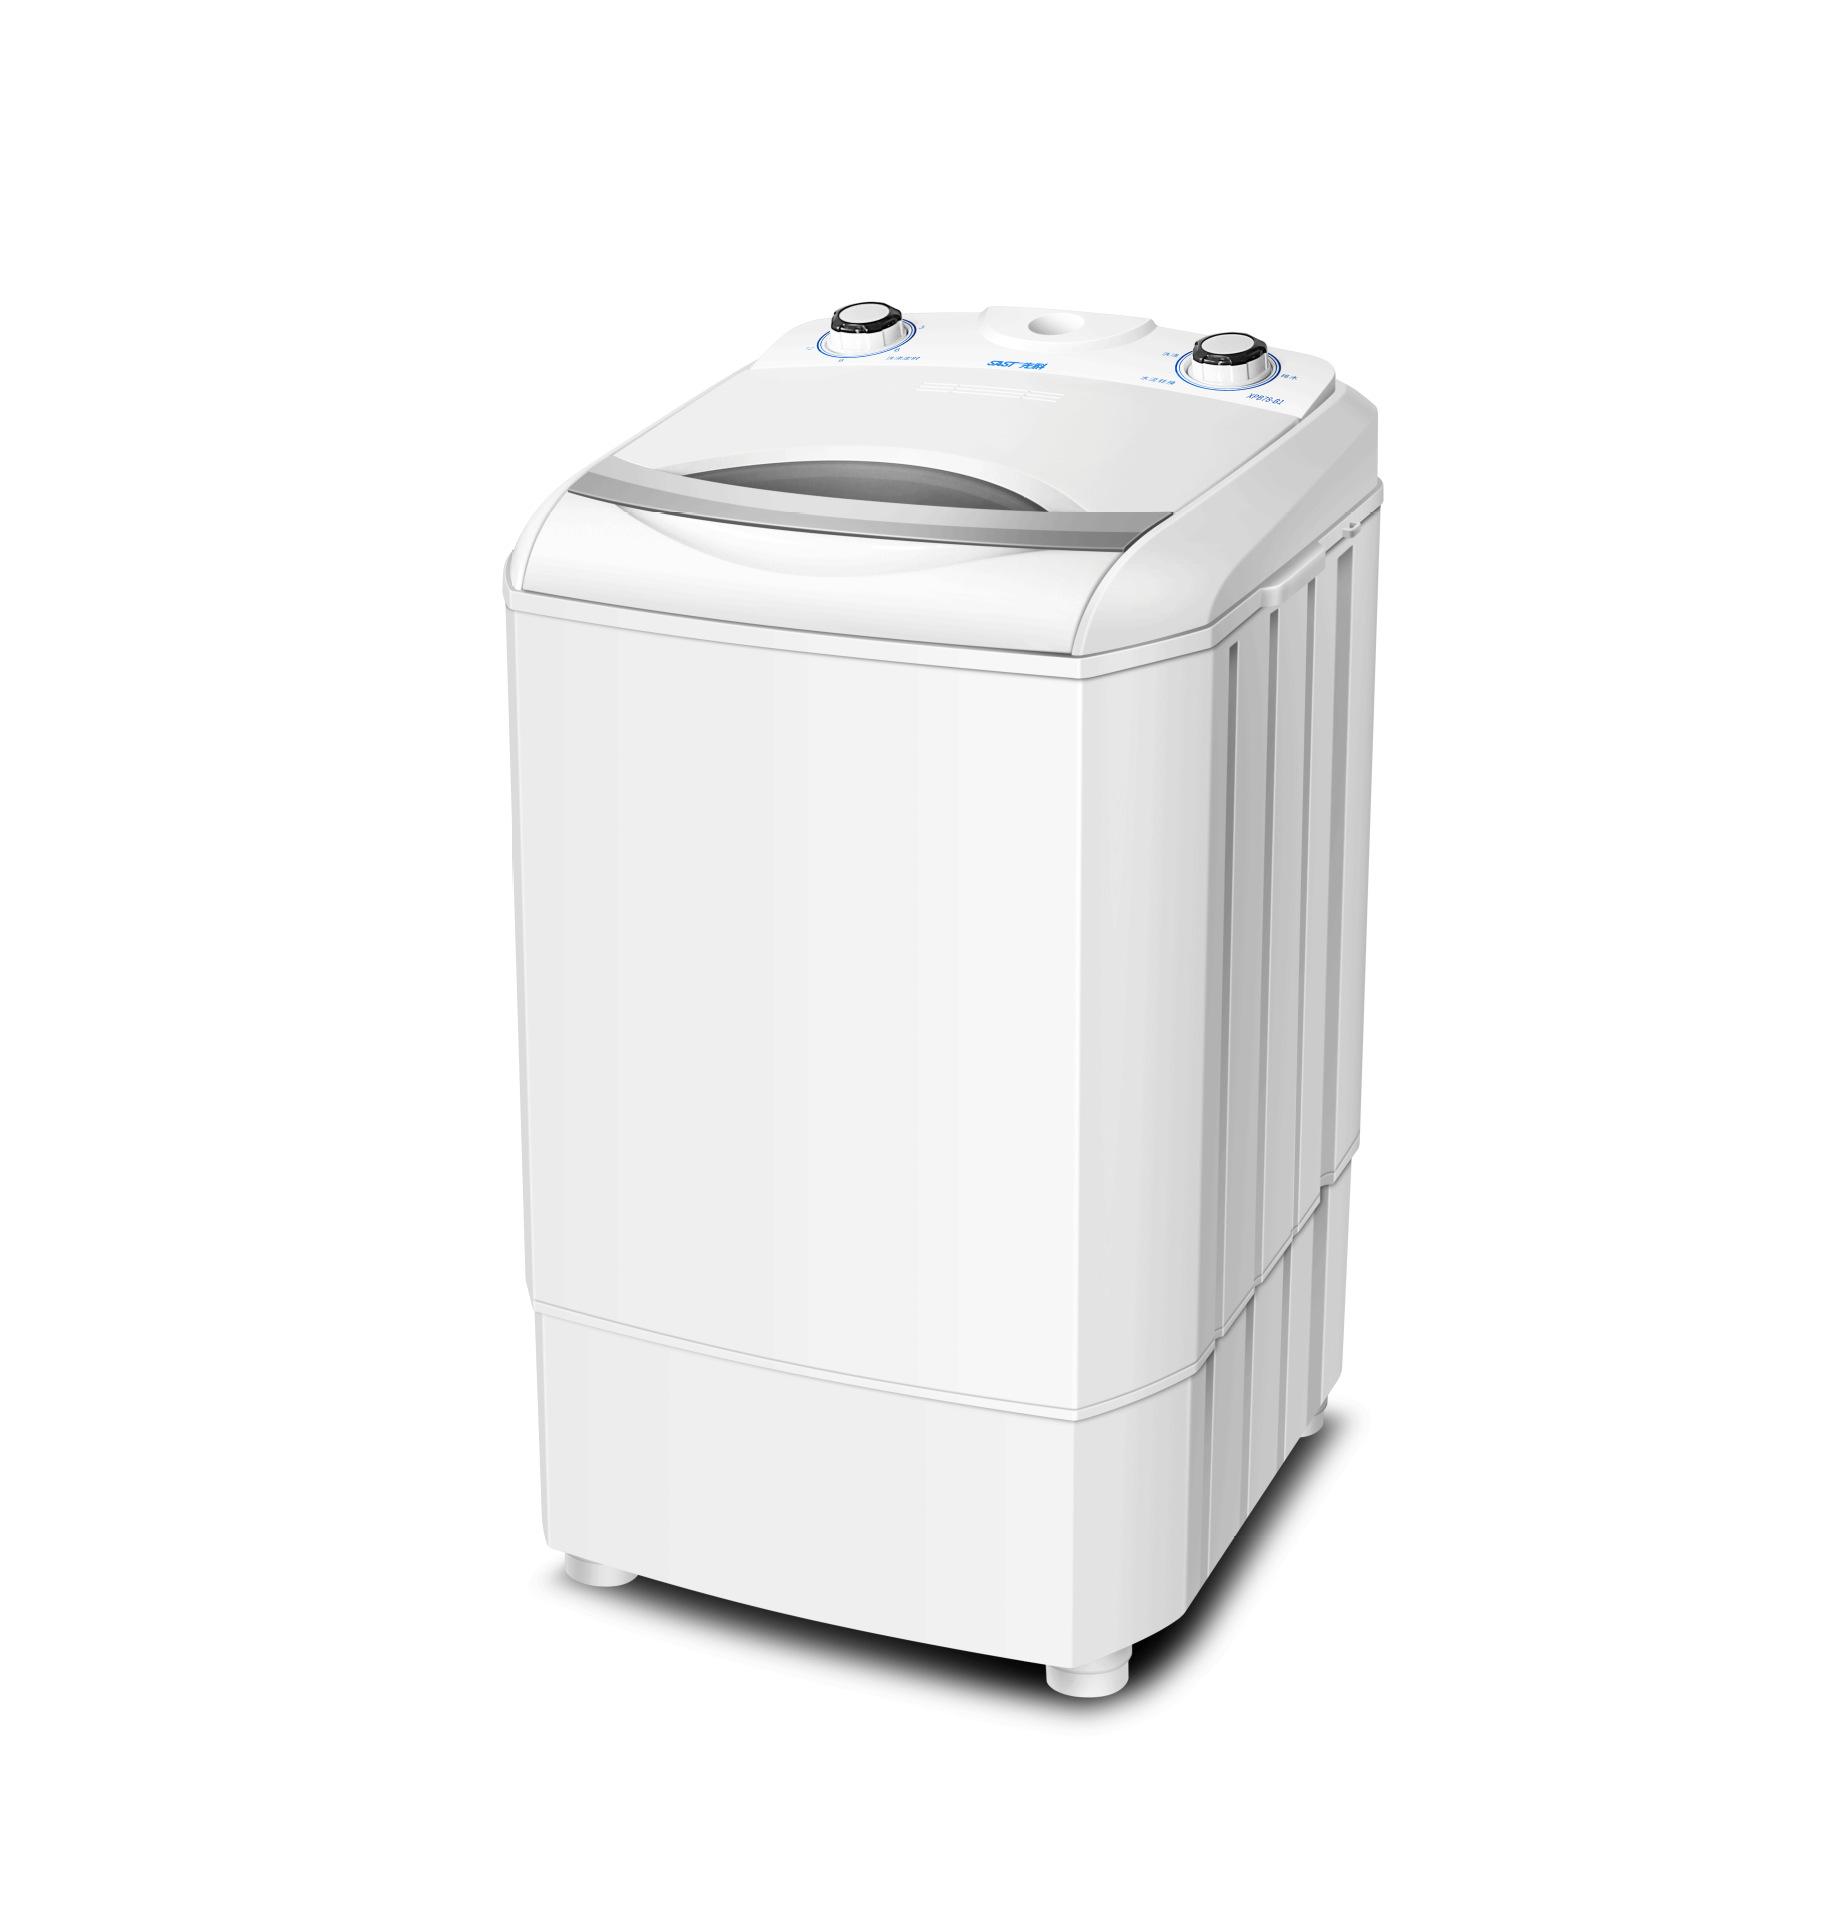 SAST Xianke XPB78-B1 semi-automatic washing machine large-capacity household dormitory washing socks